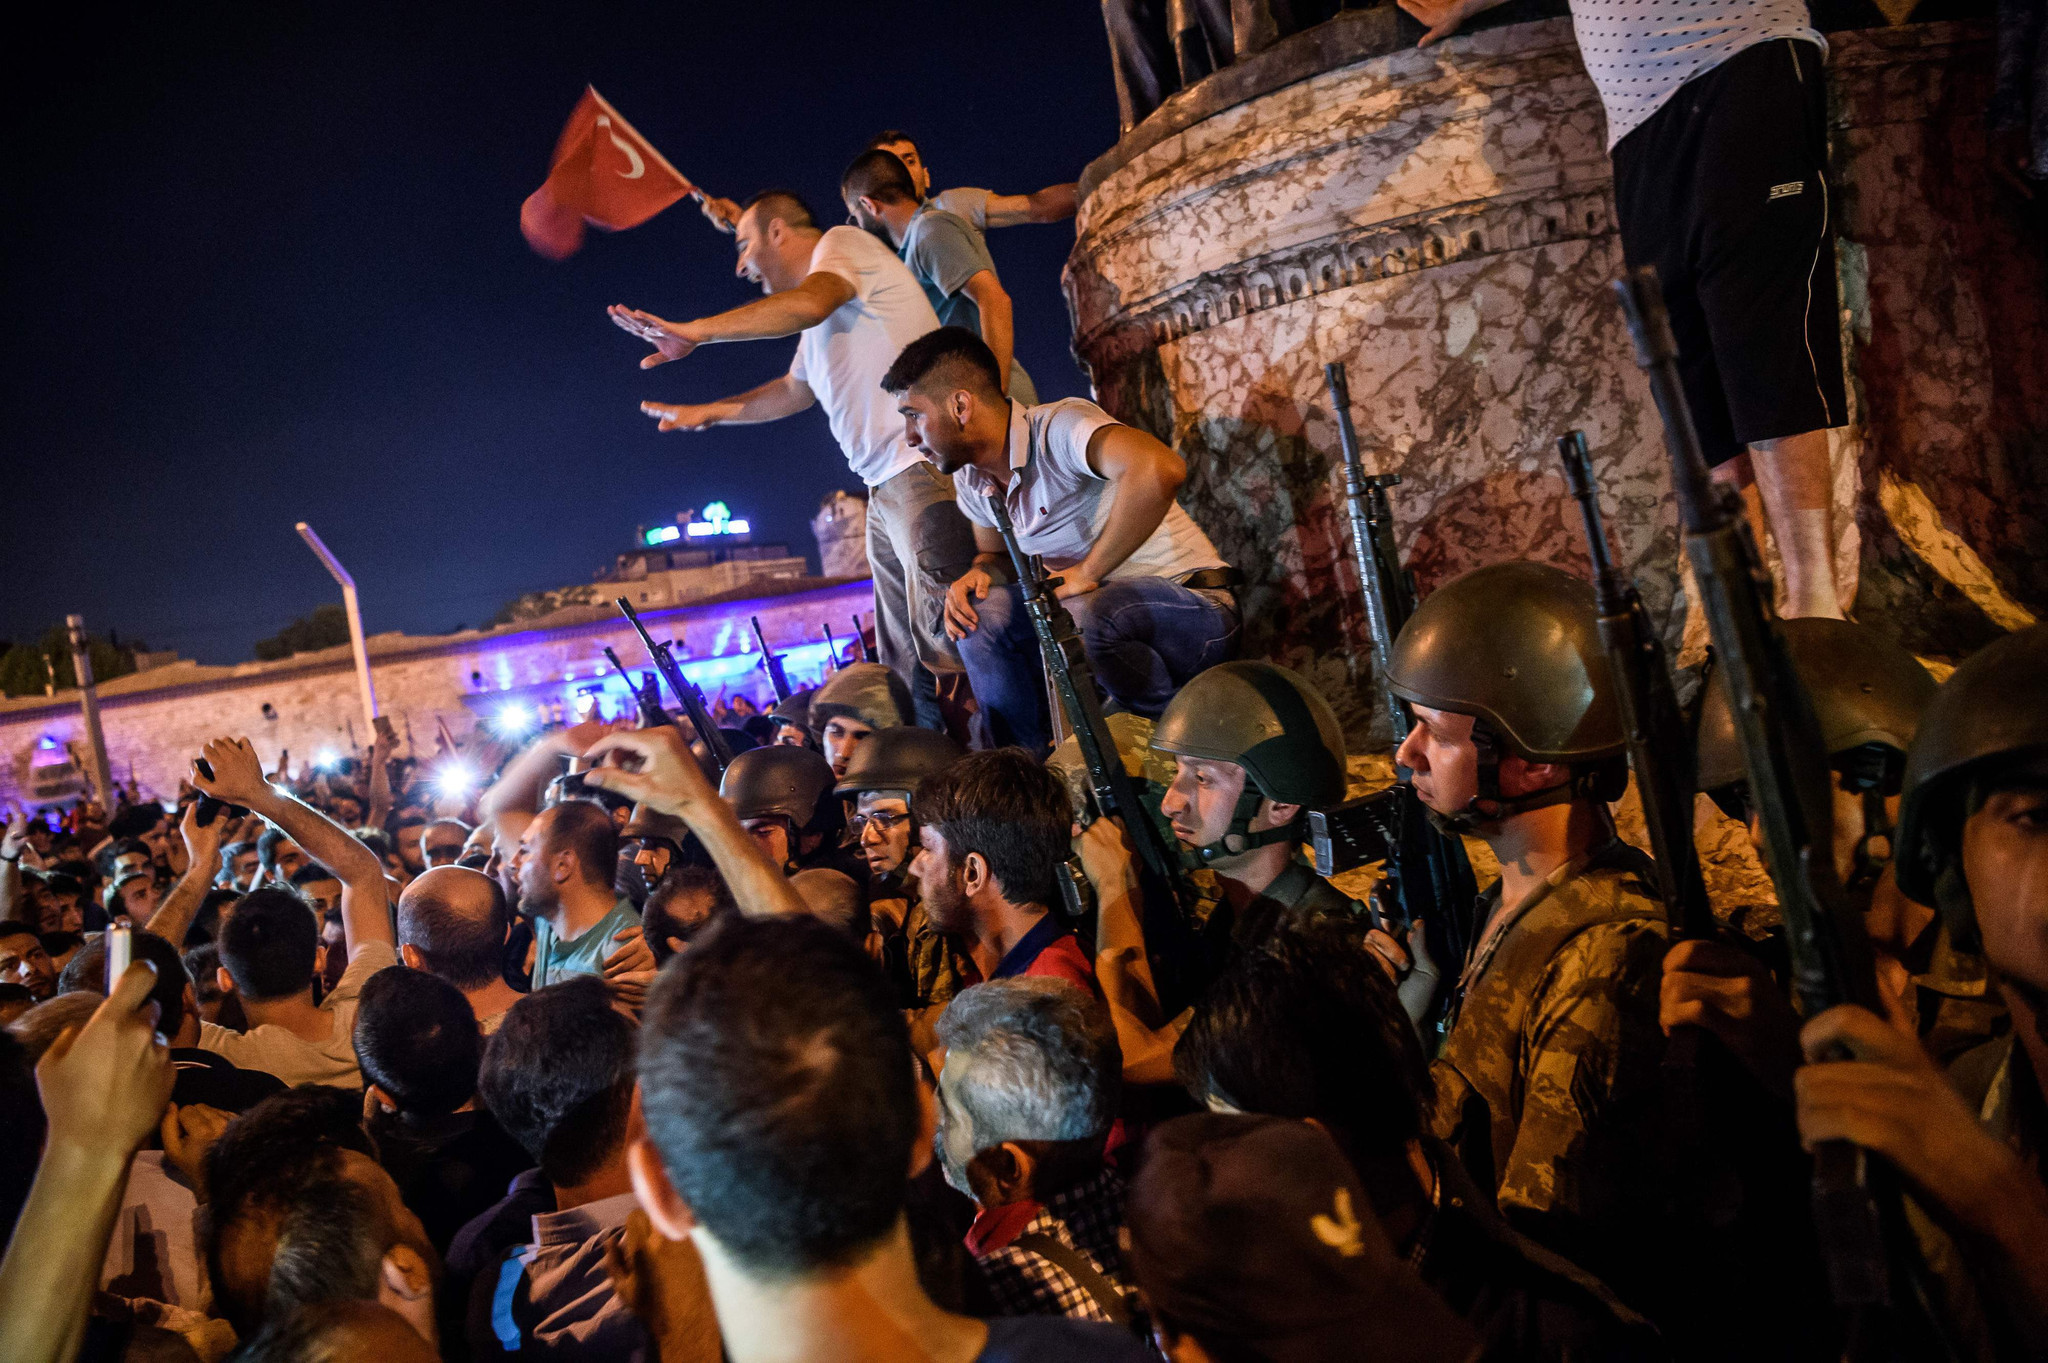 Os-serge-ibaka-turkey-military-coup-20160715